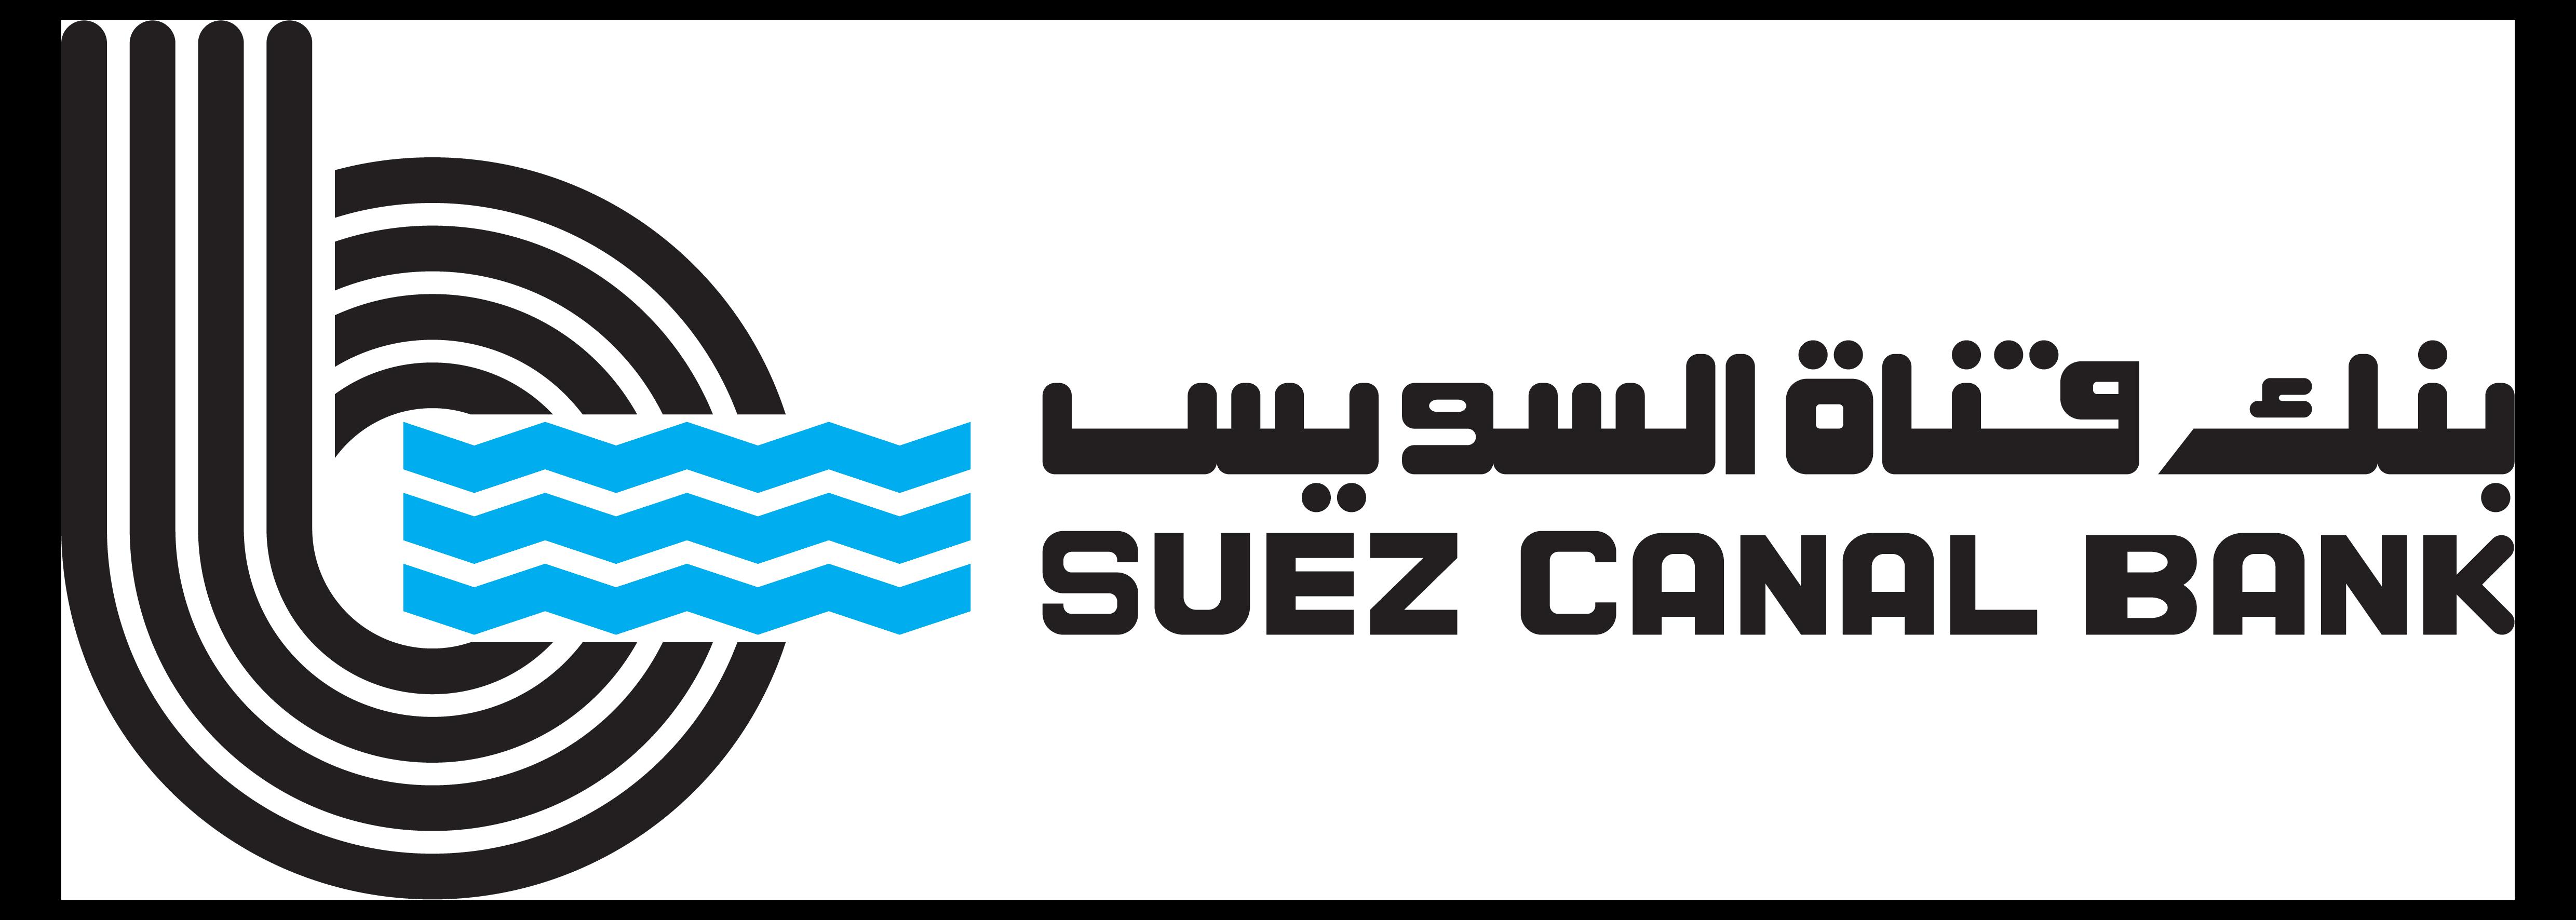 Suez Canal Bank